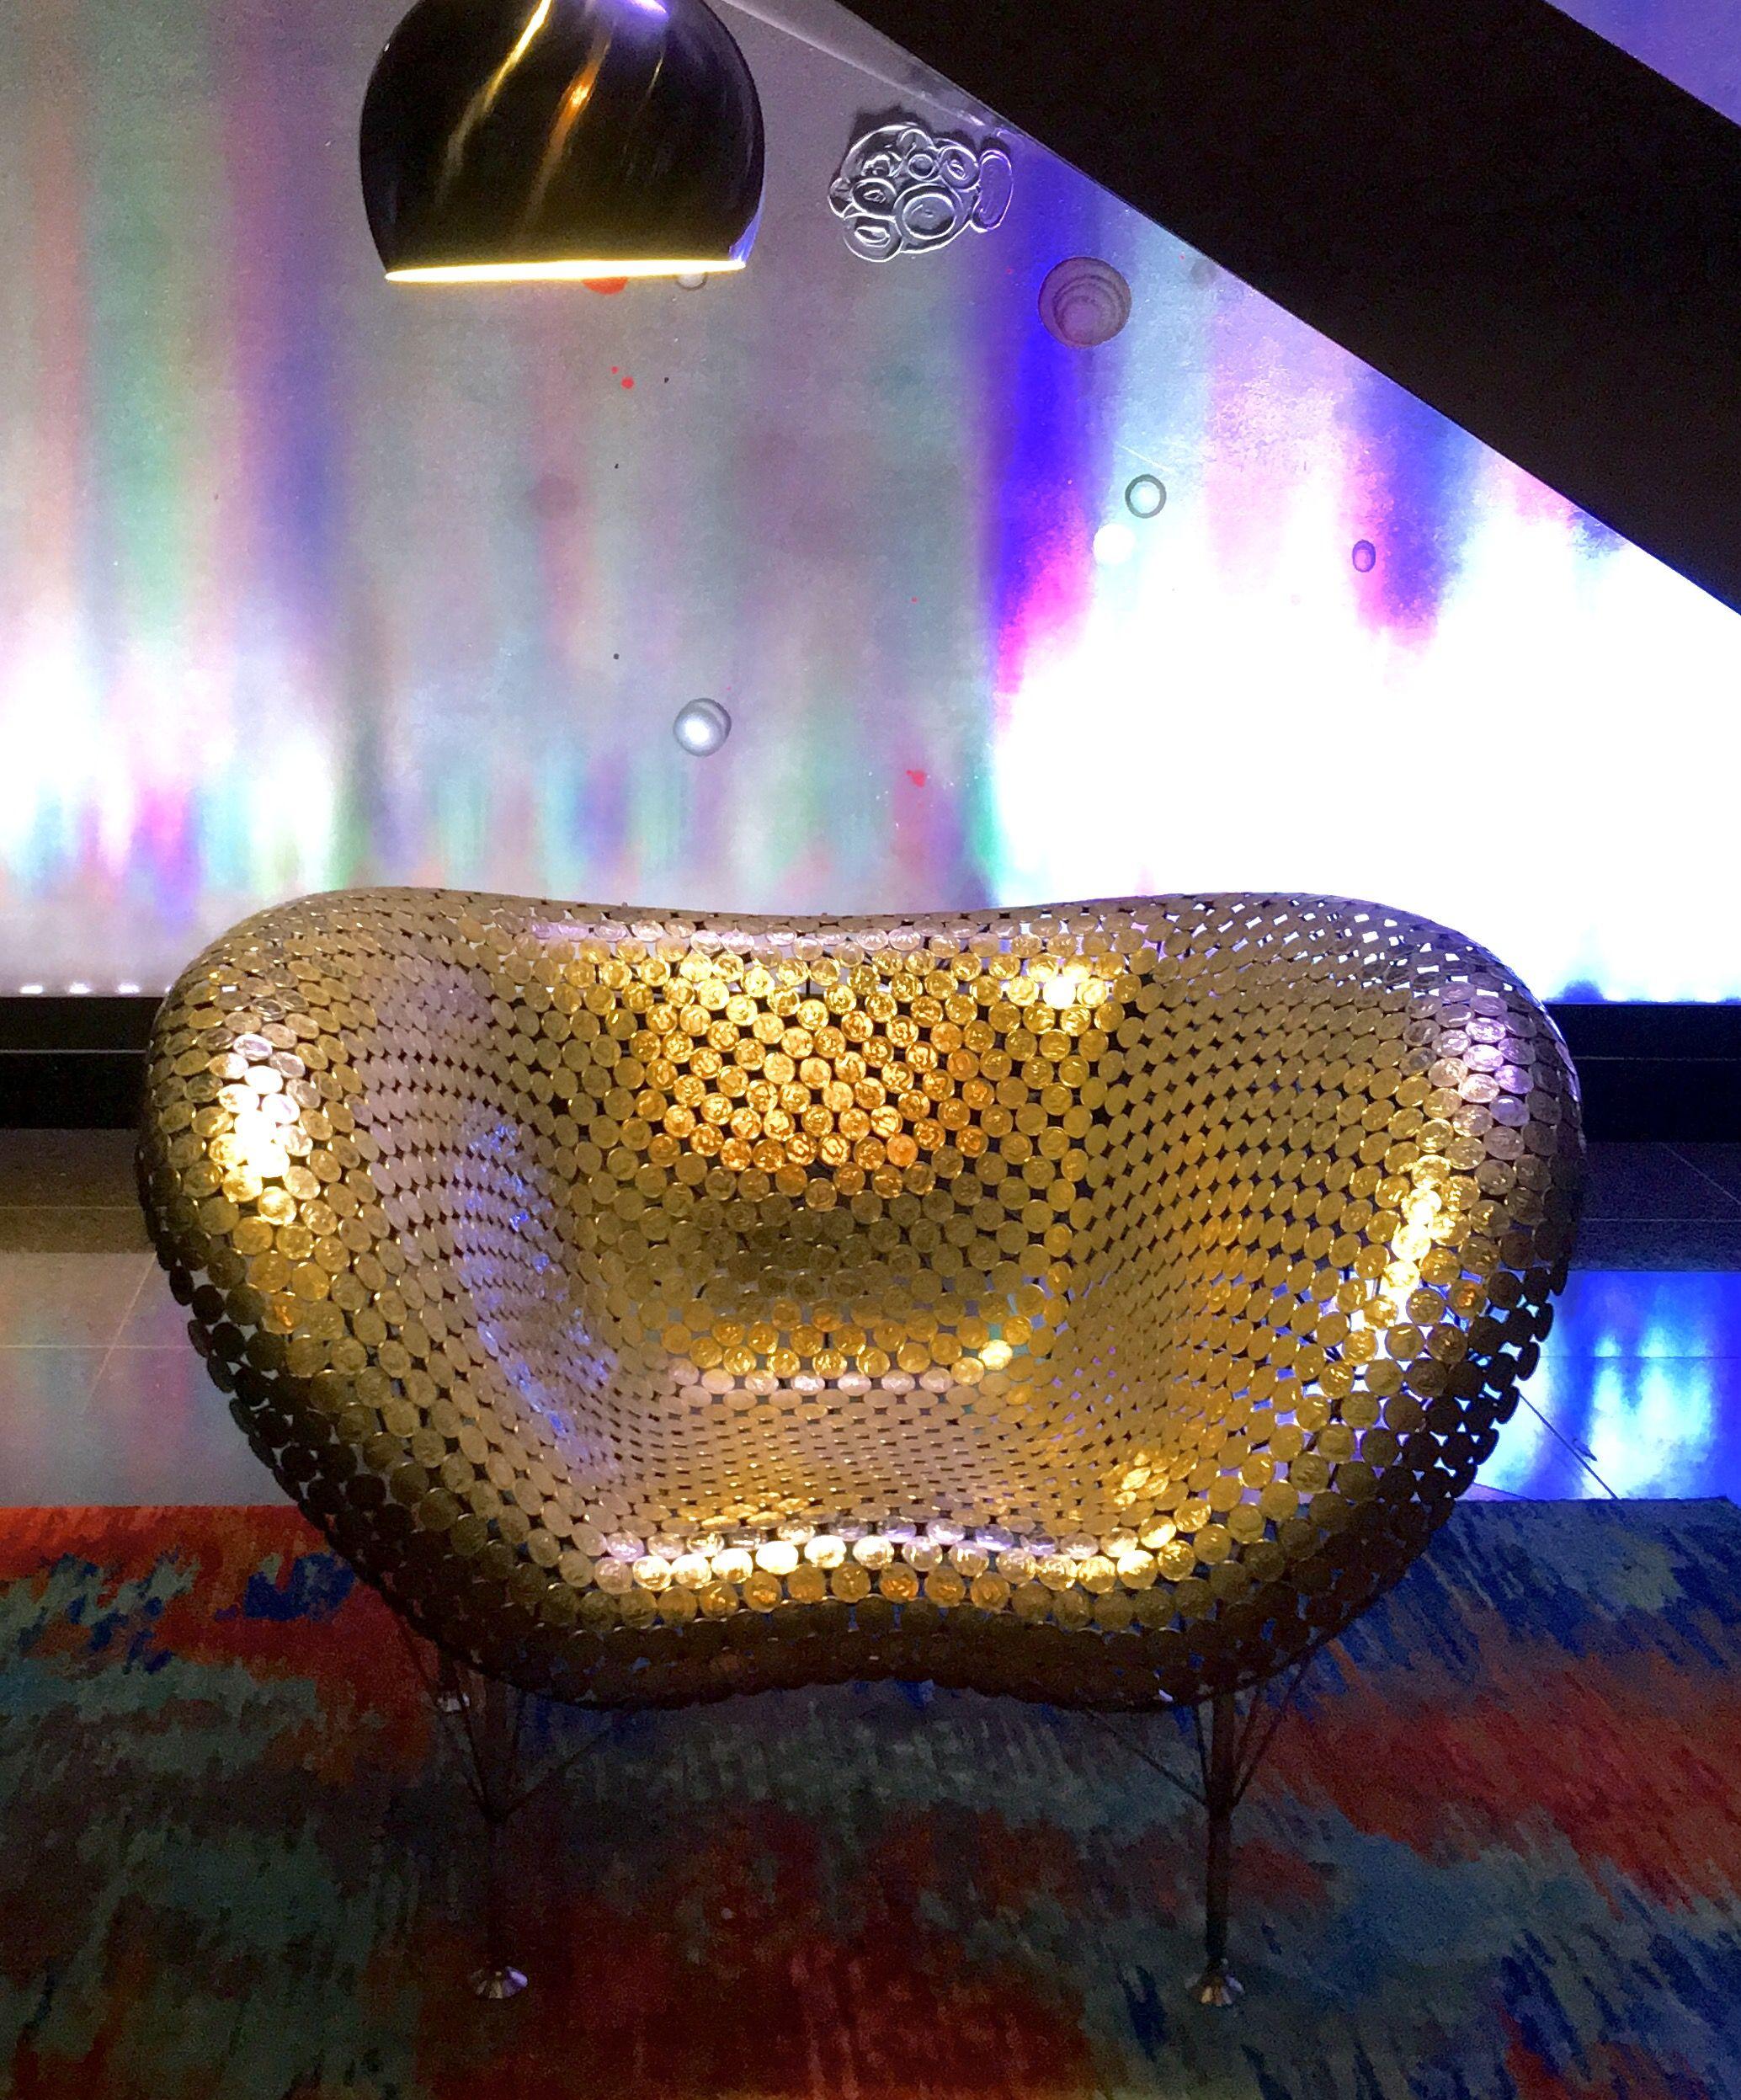 Pin by Randi Norman on Furniture Retro to Modern | Modern ...